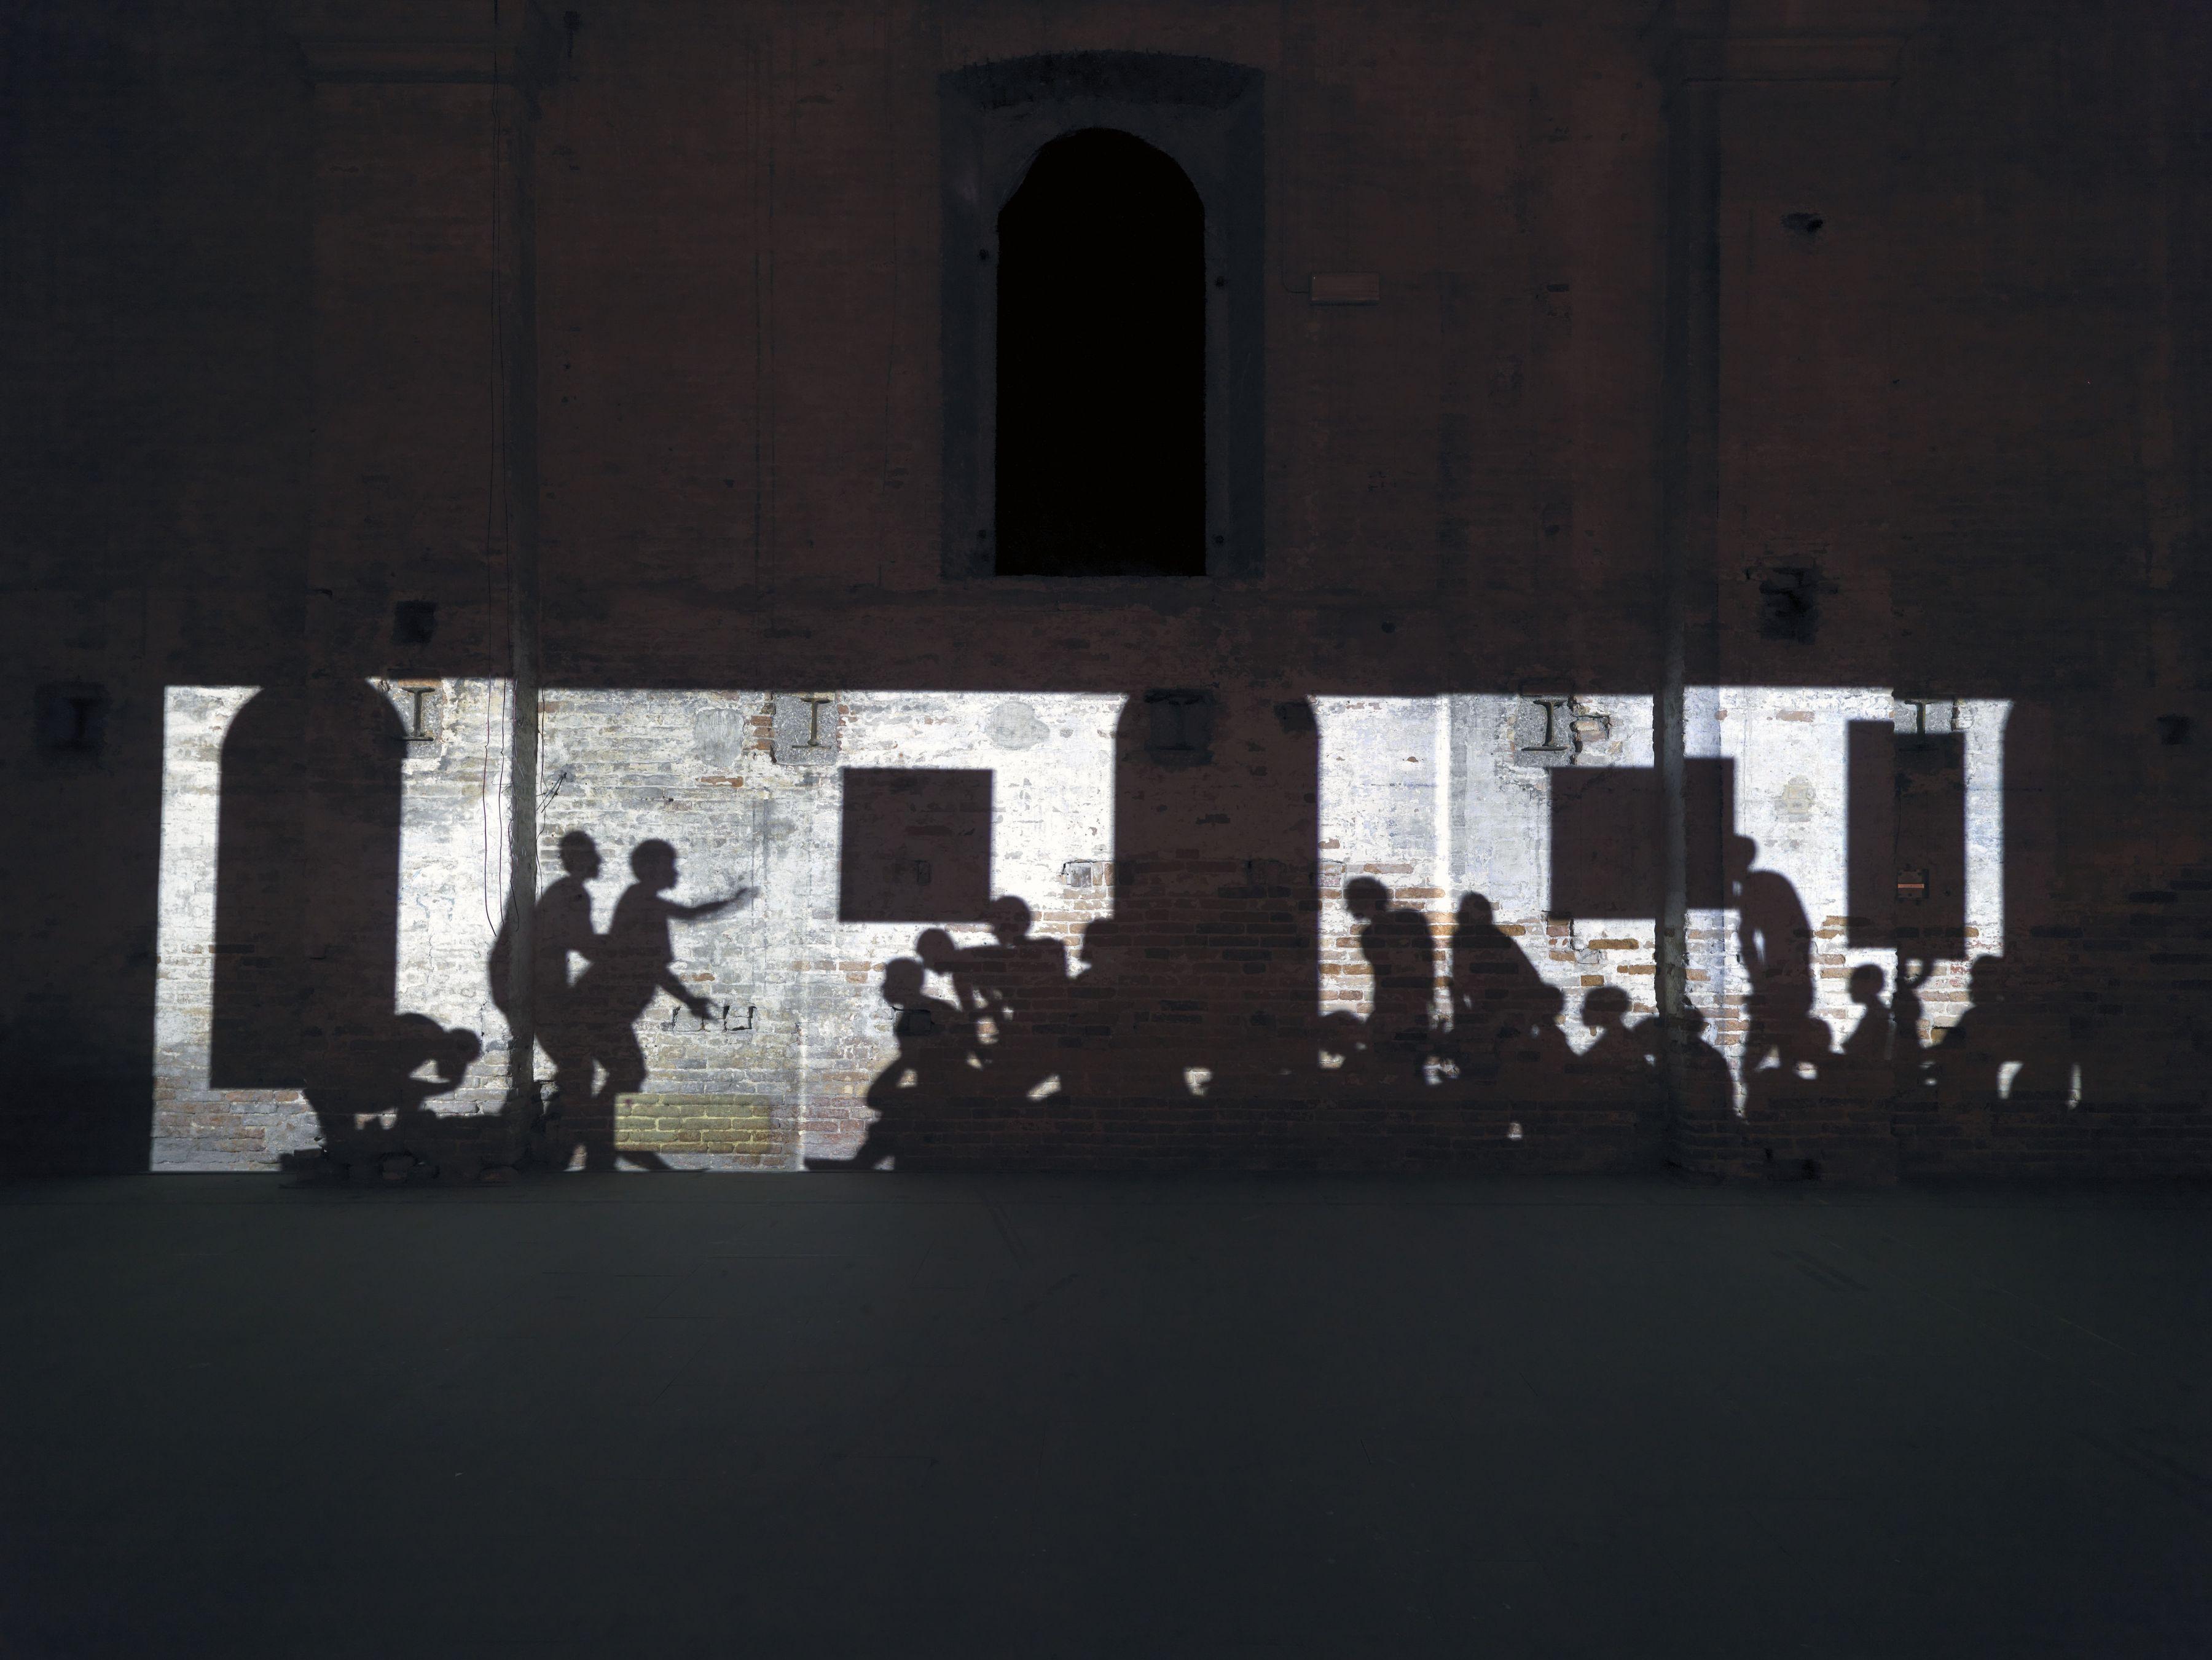 Sade for Sade's sake, 2009, Installation view, Making Worlds,53rd Venice Biennale, Venice, 2009